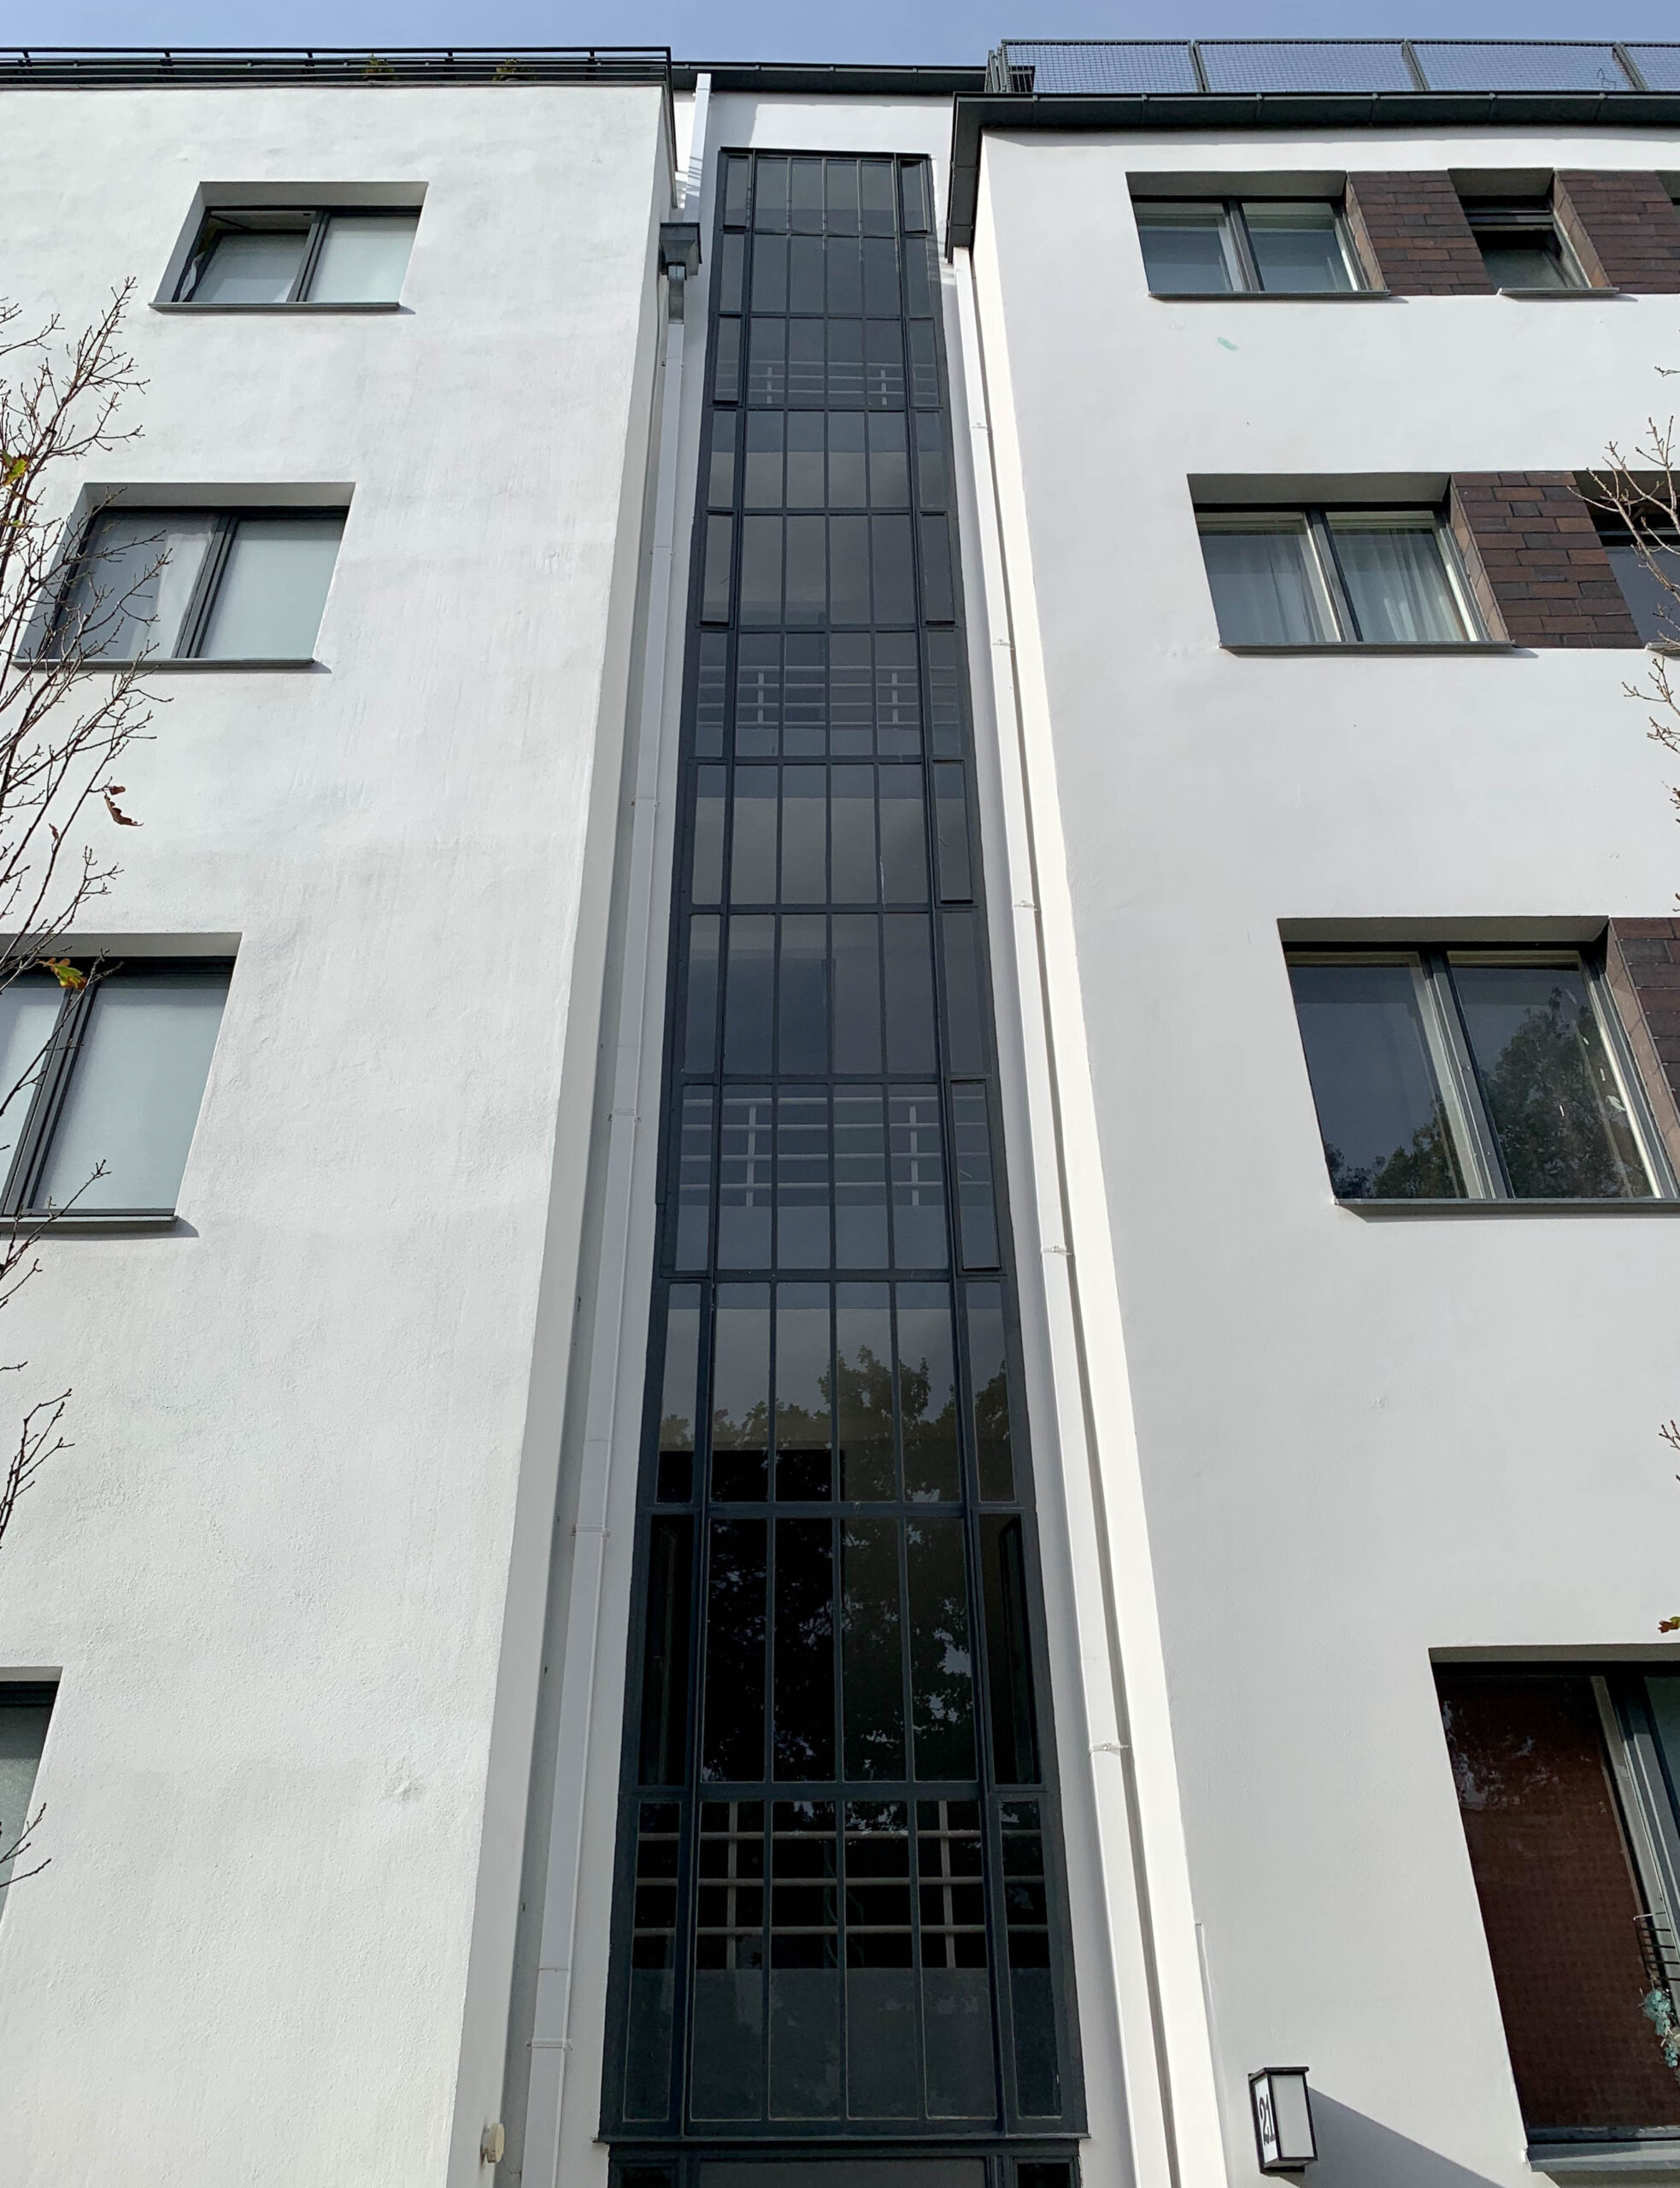 Residential complex, Siemensstadt, 1929-1931. Architect: Walter Gropius